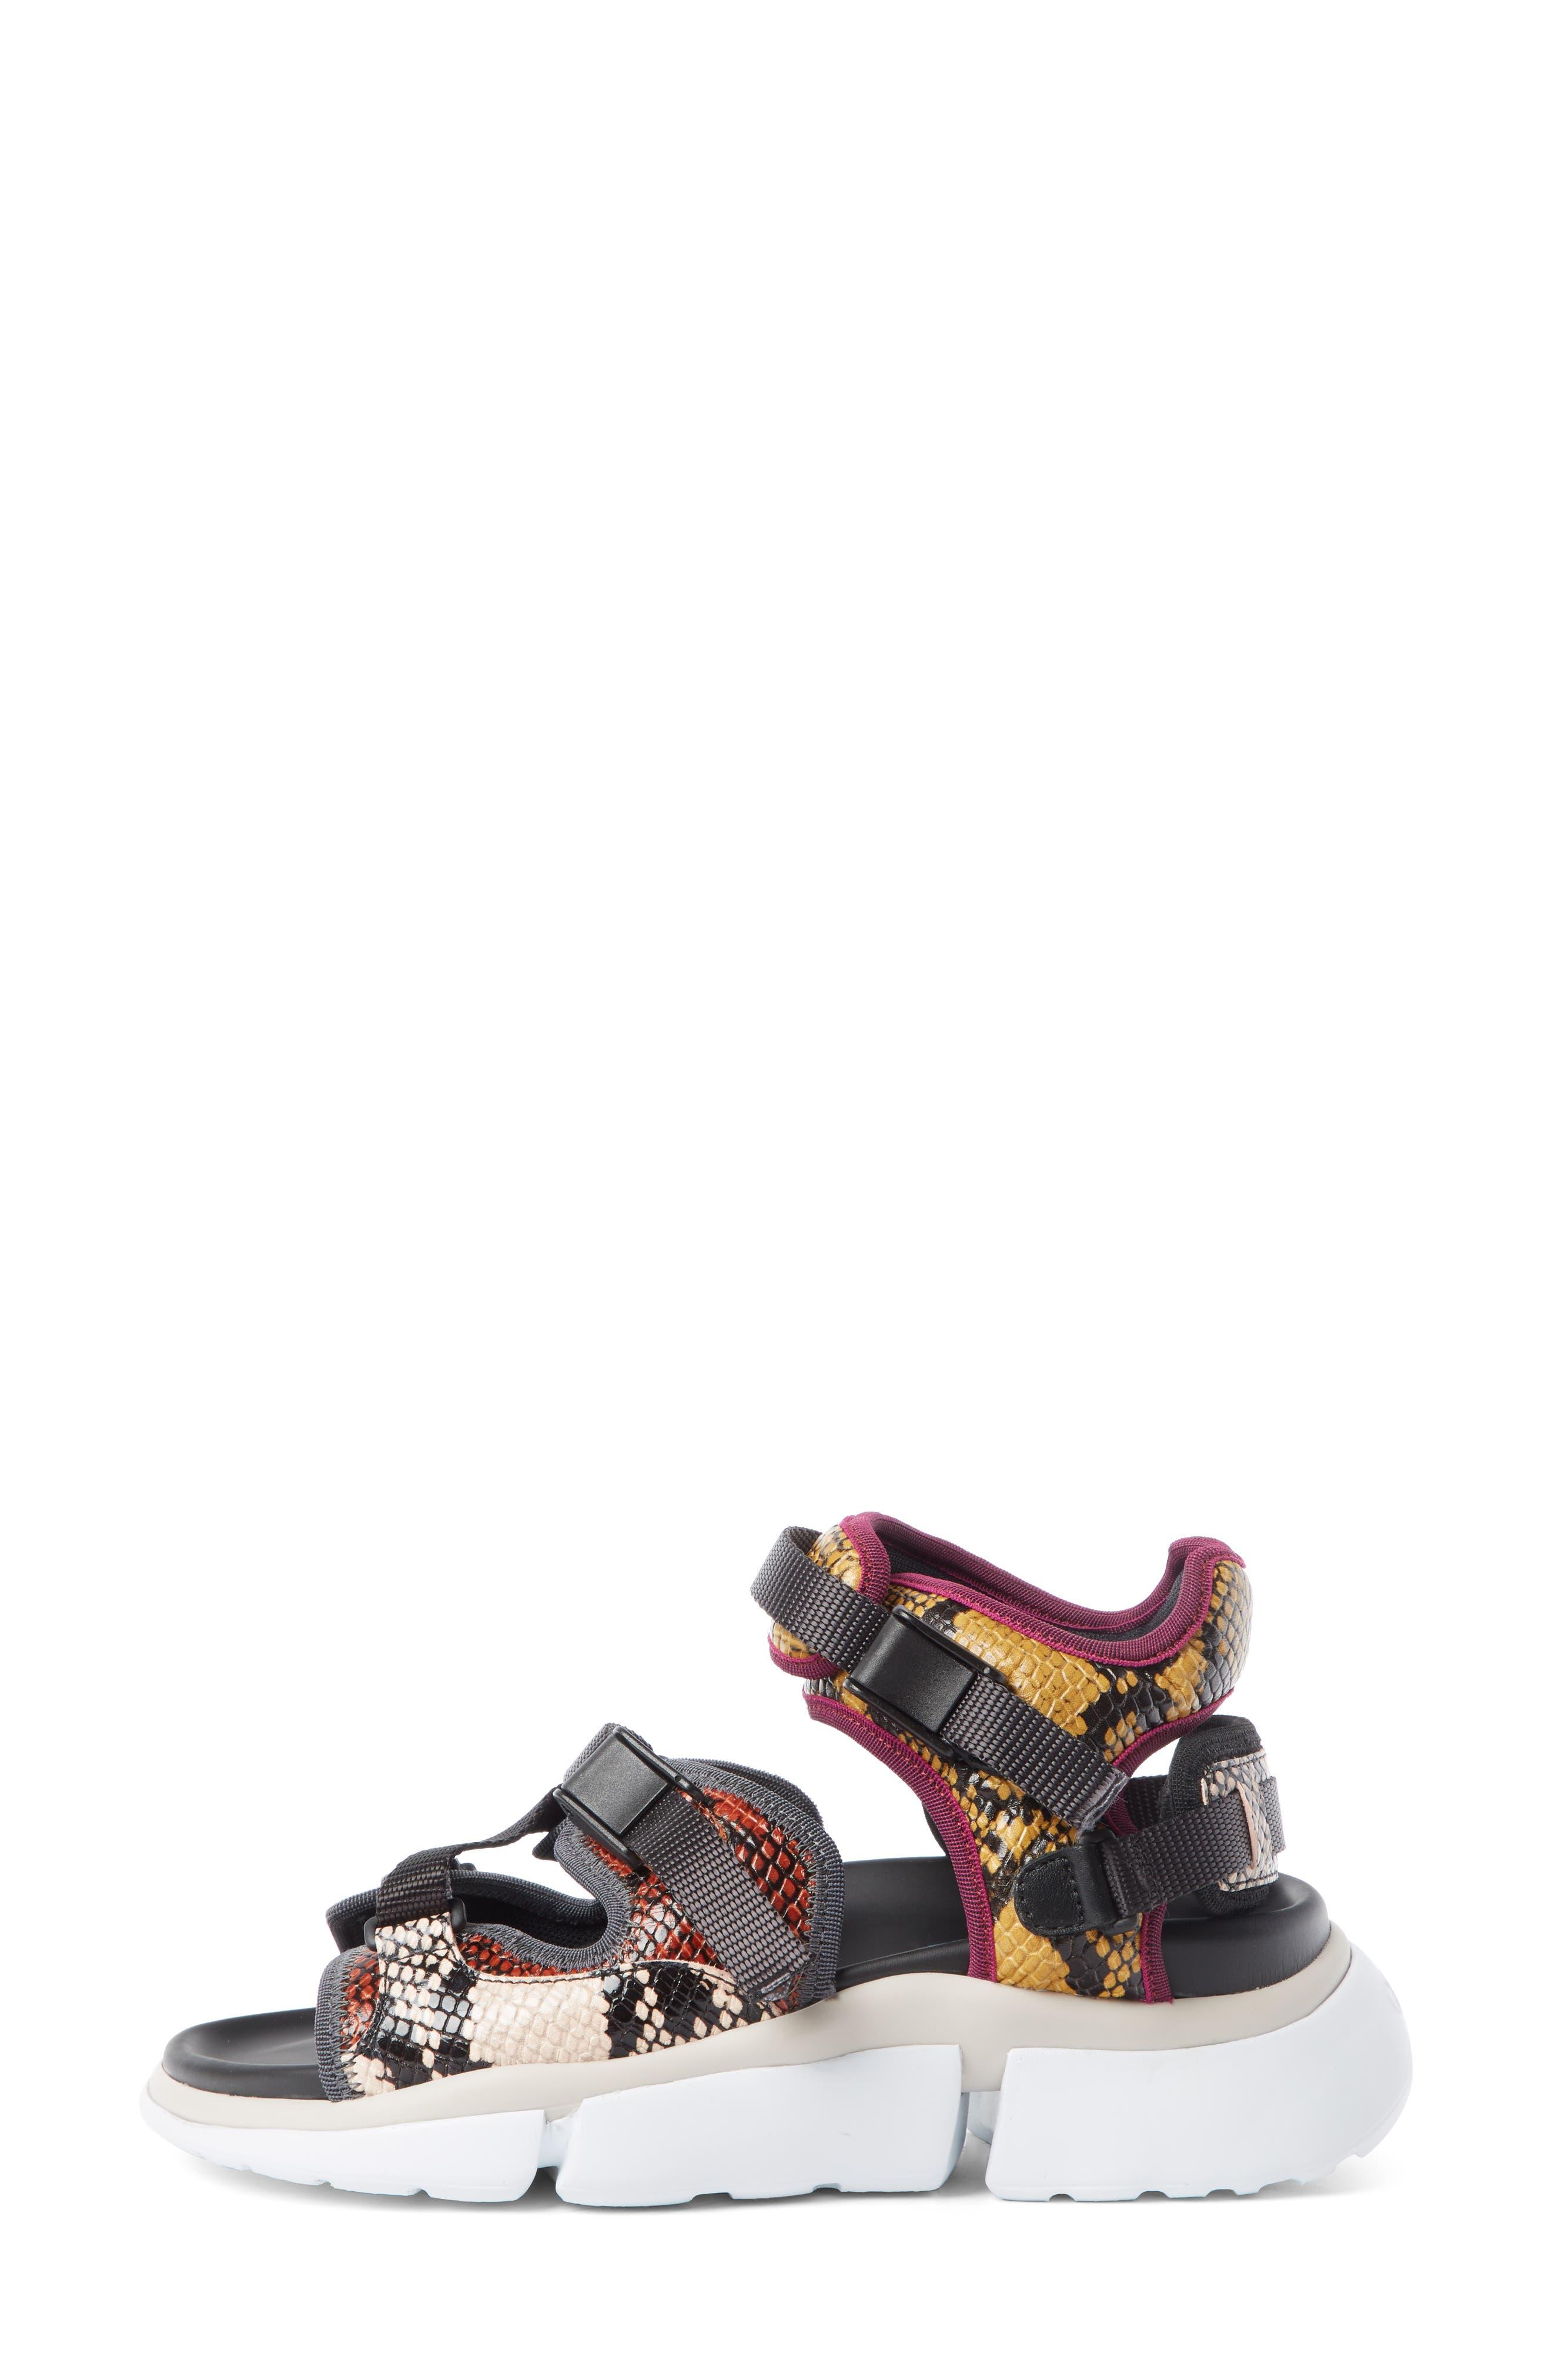 Sonnie Sporty Sandal,                             Alternate thumbnail 3, color,                             SEPTEMBER SUN LEATHER